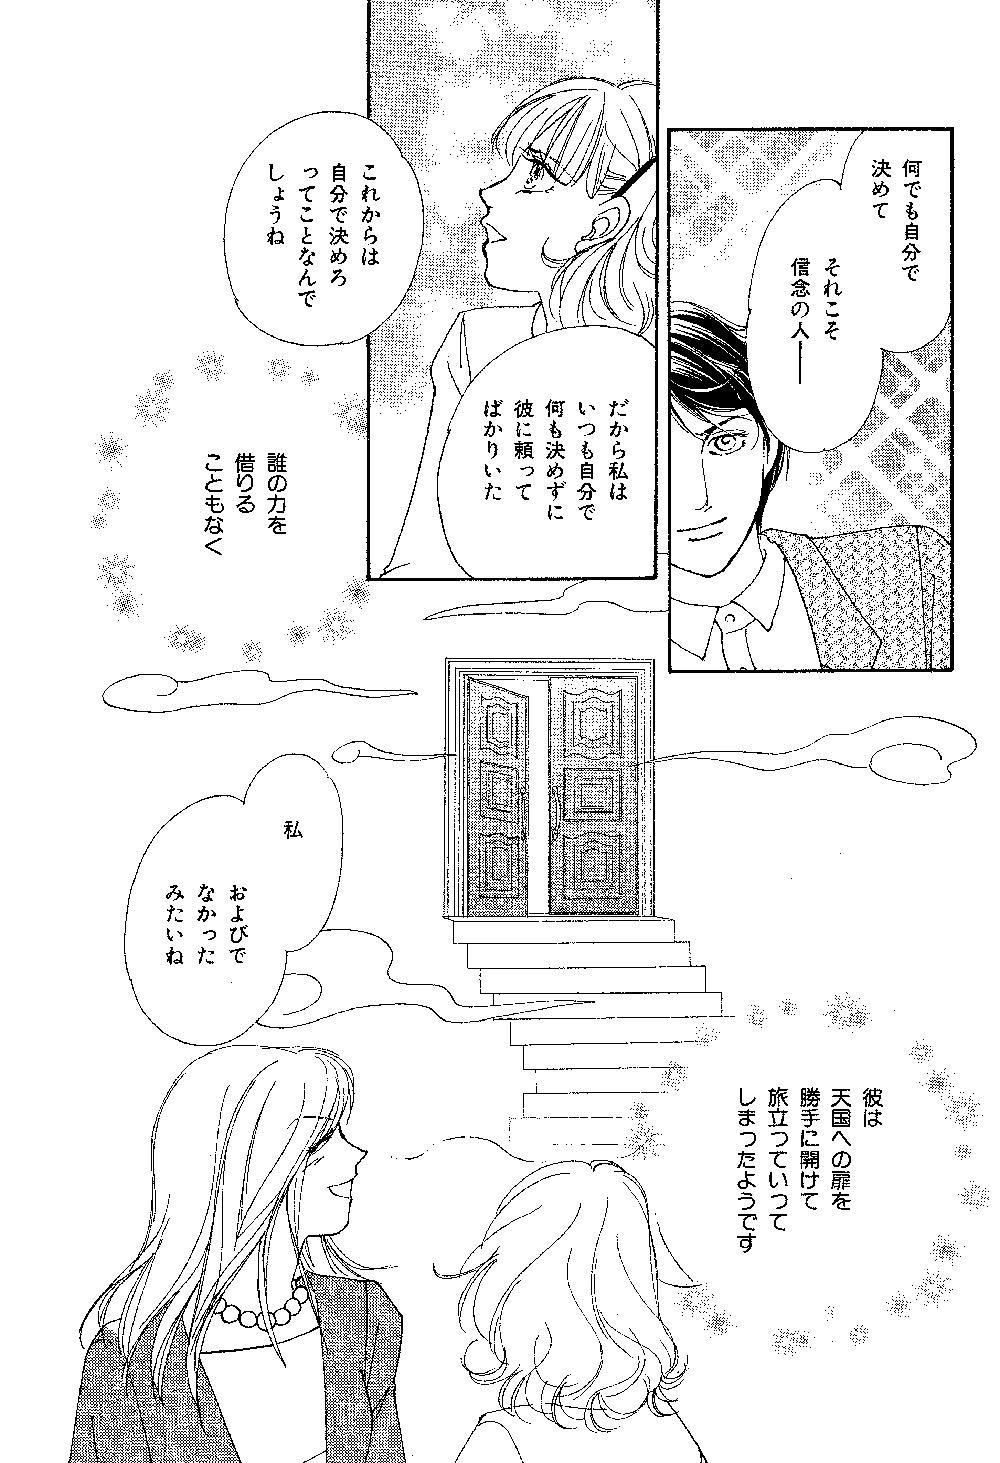 mayuri_0001_0044.jpg